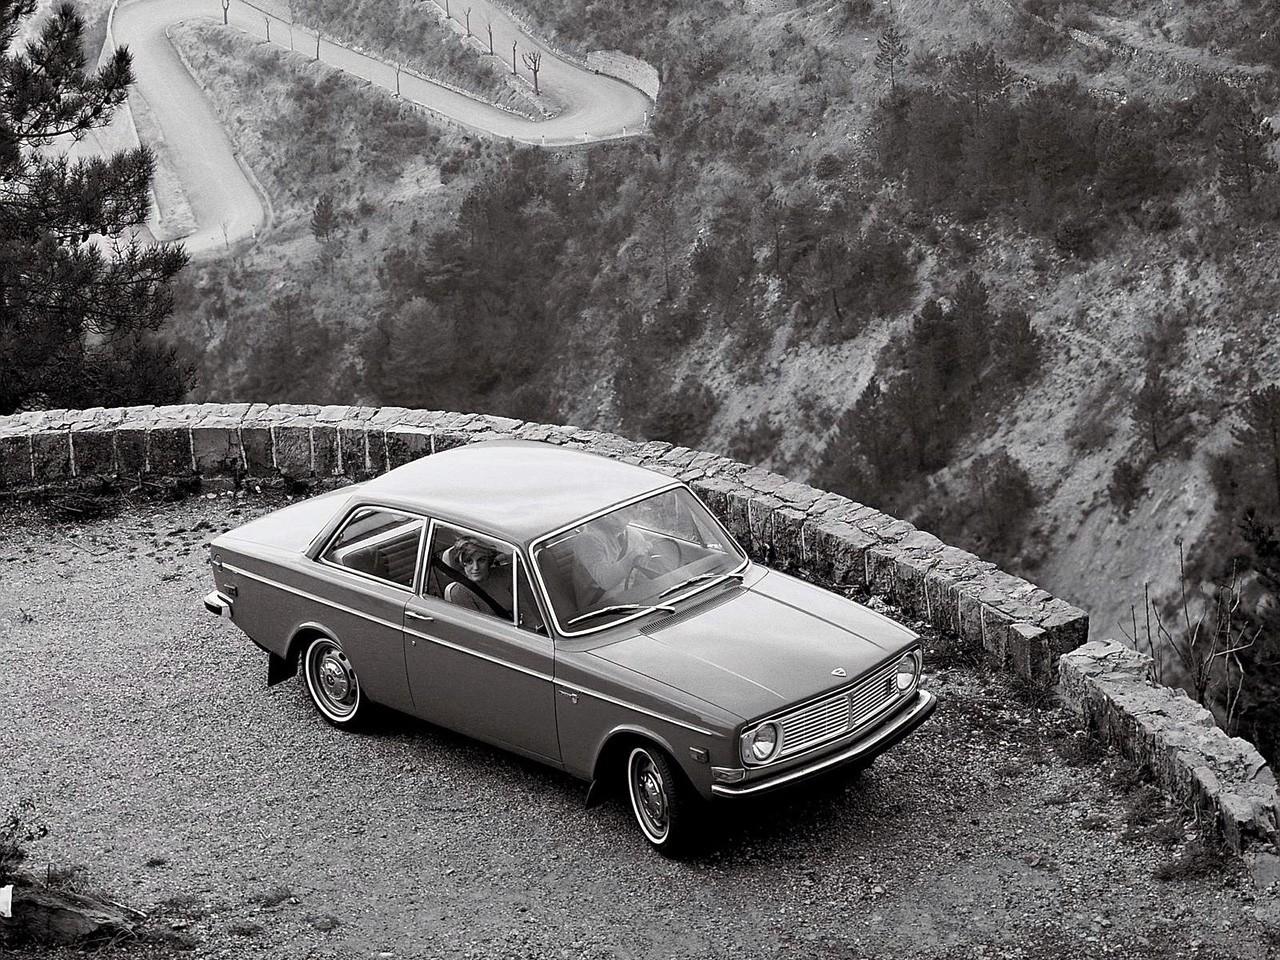 7 Passenger Suv >> VOLVO 142 specs & photos - 1967, 1968, 1969, 1970, 1971 ...